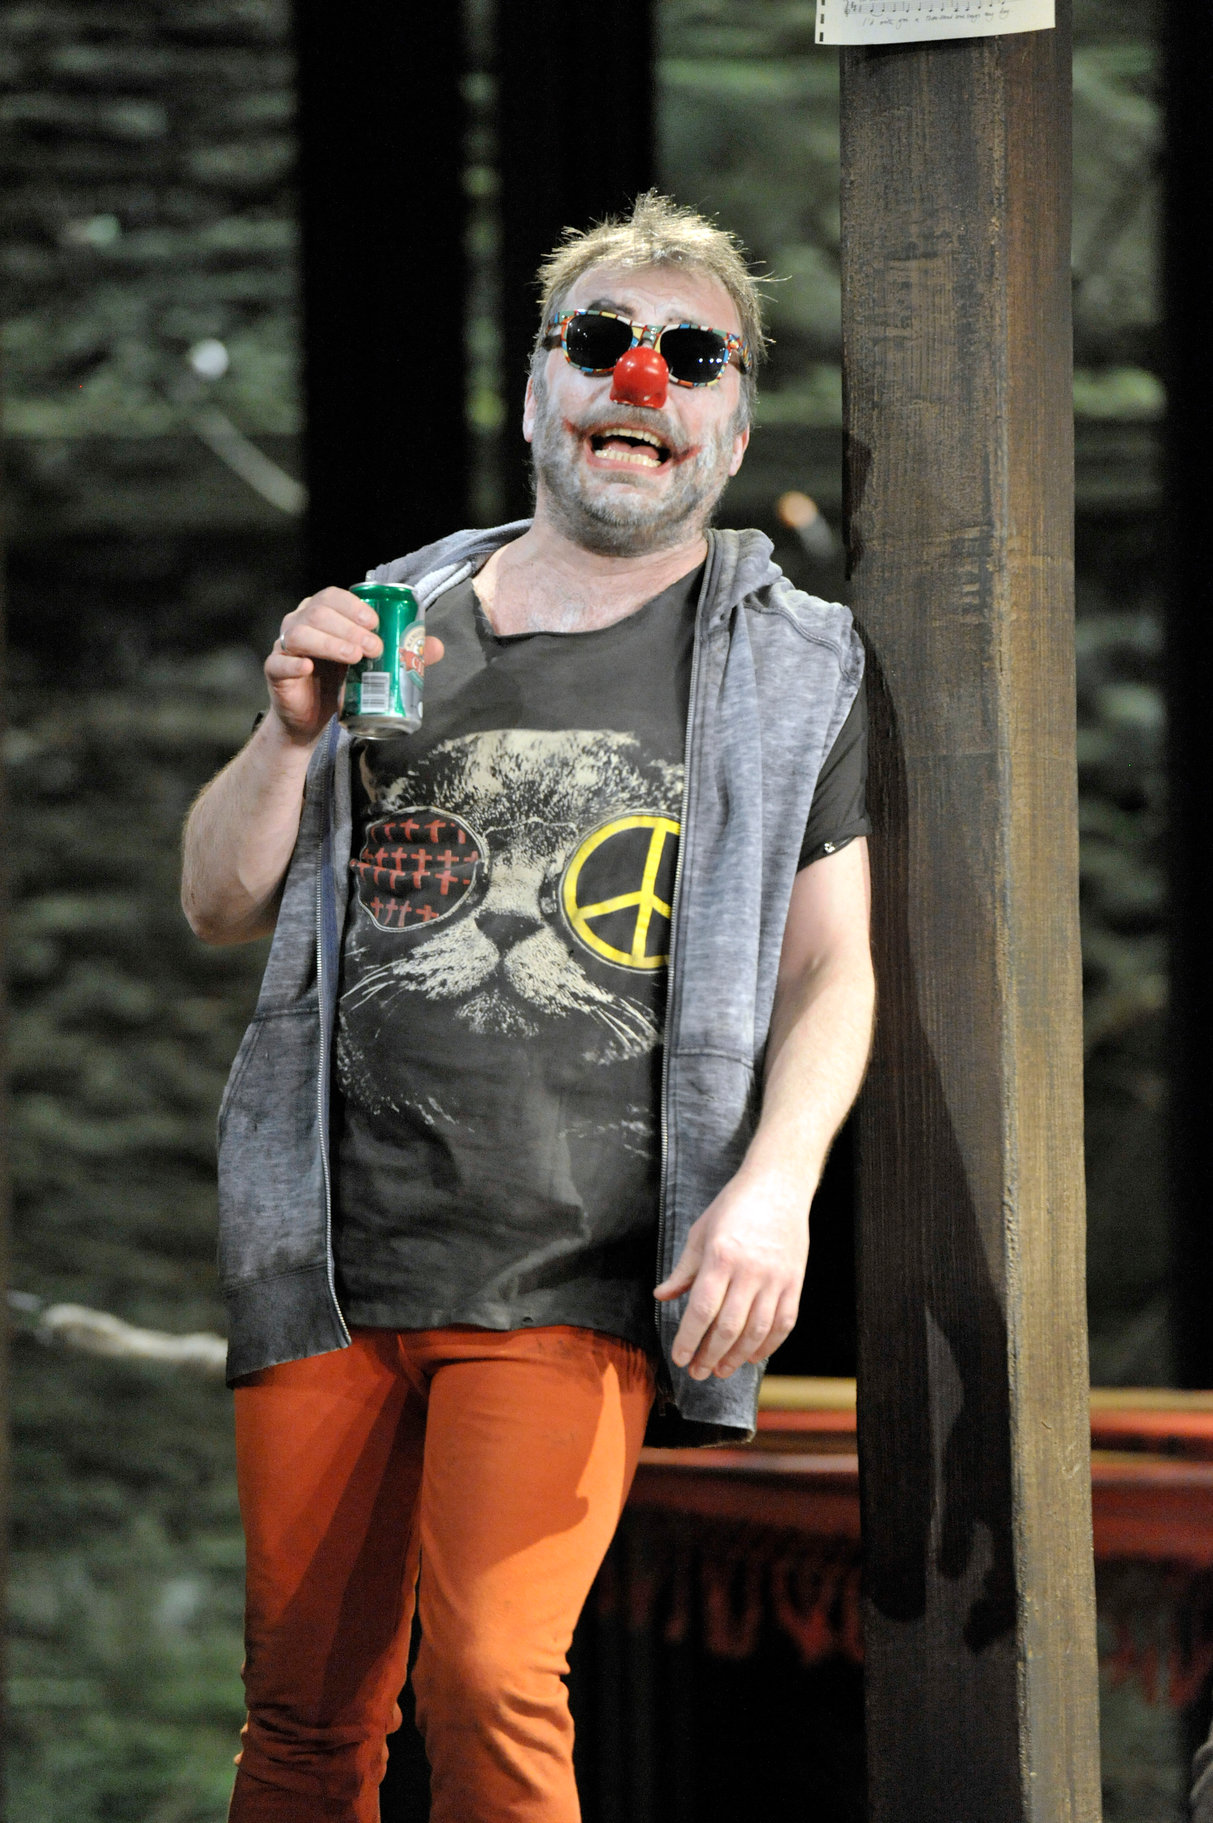 A scruffy man in sunglasses and a red nose.